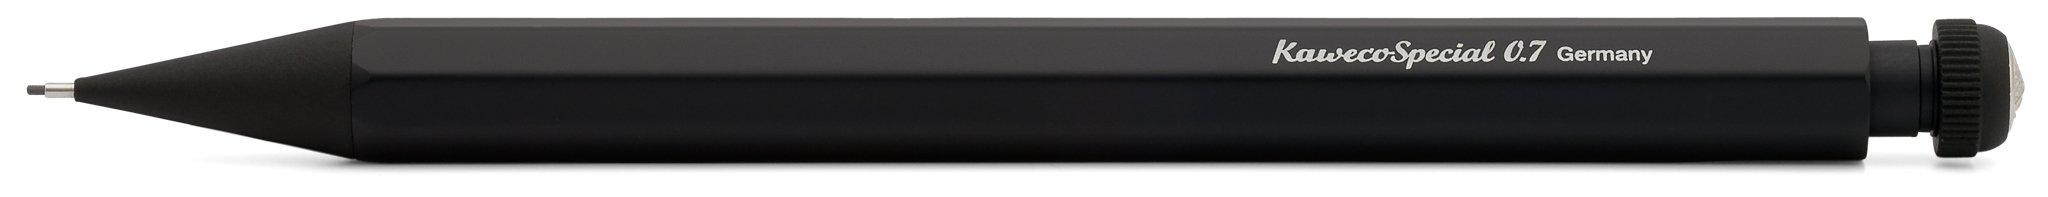 Kaweco Special Mechanical Pencil S short Black 0.7 mm